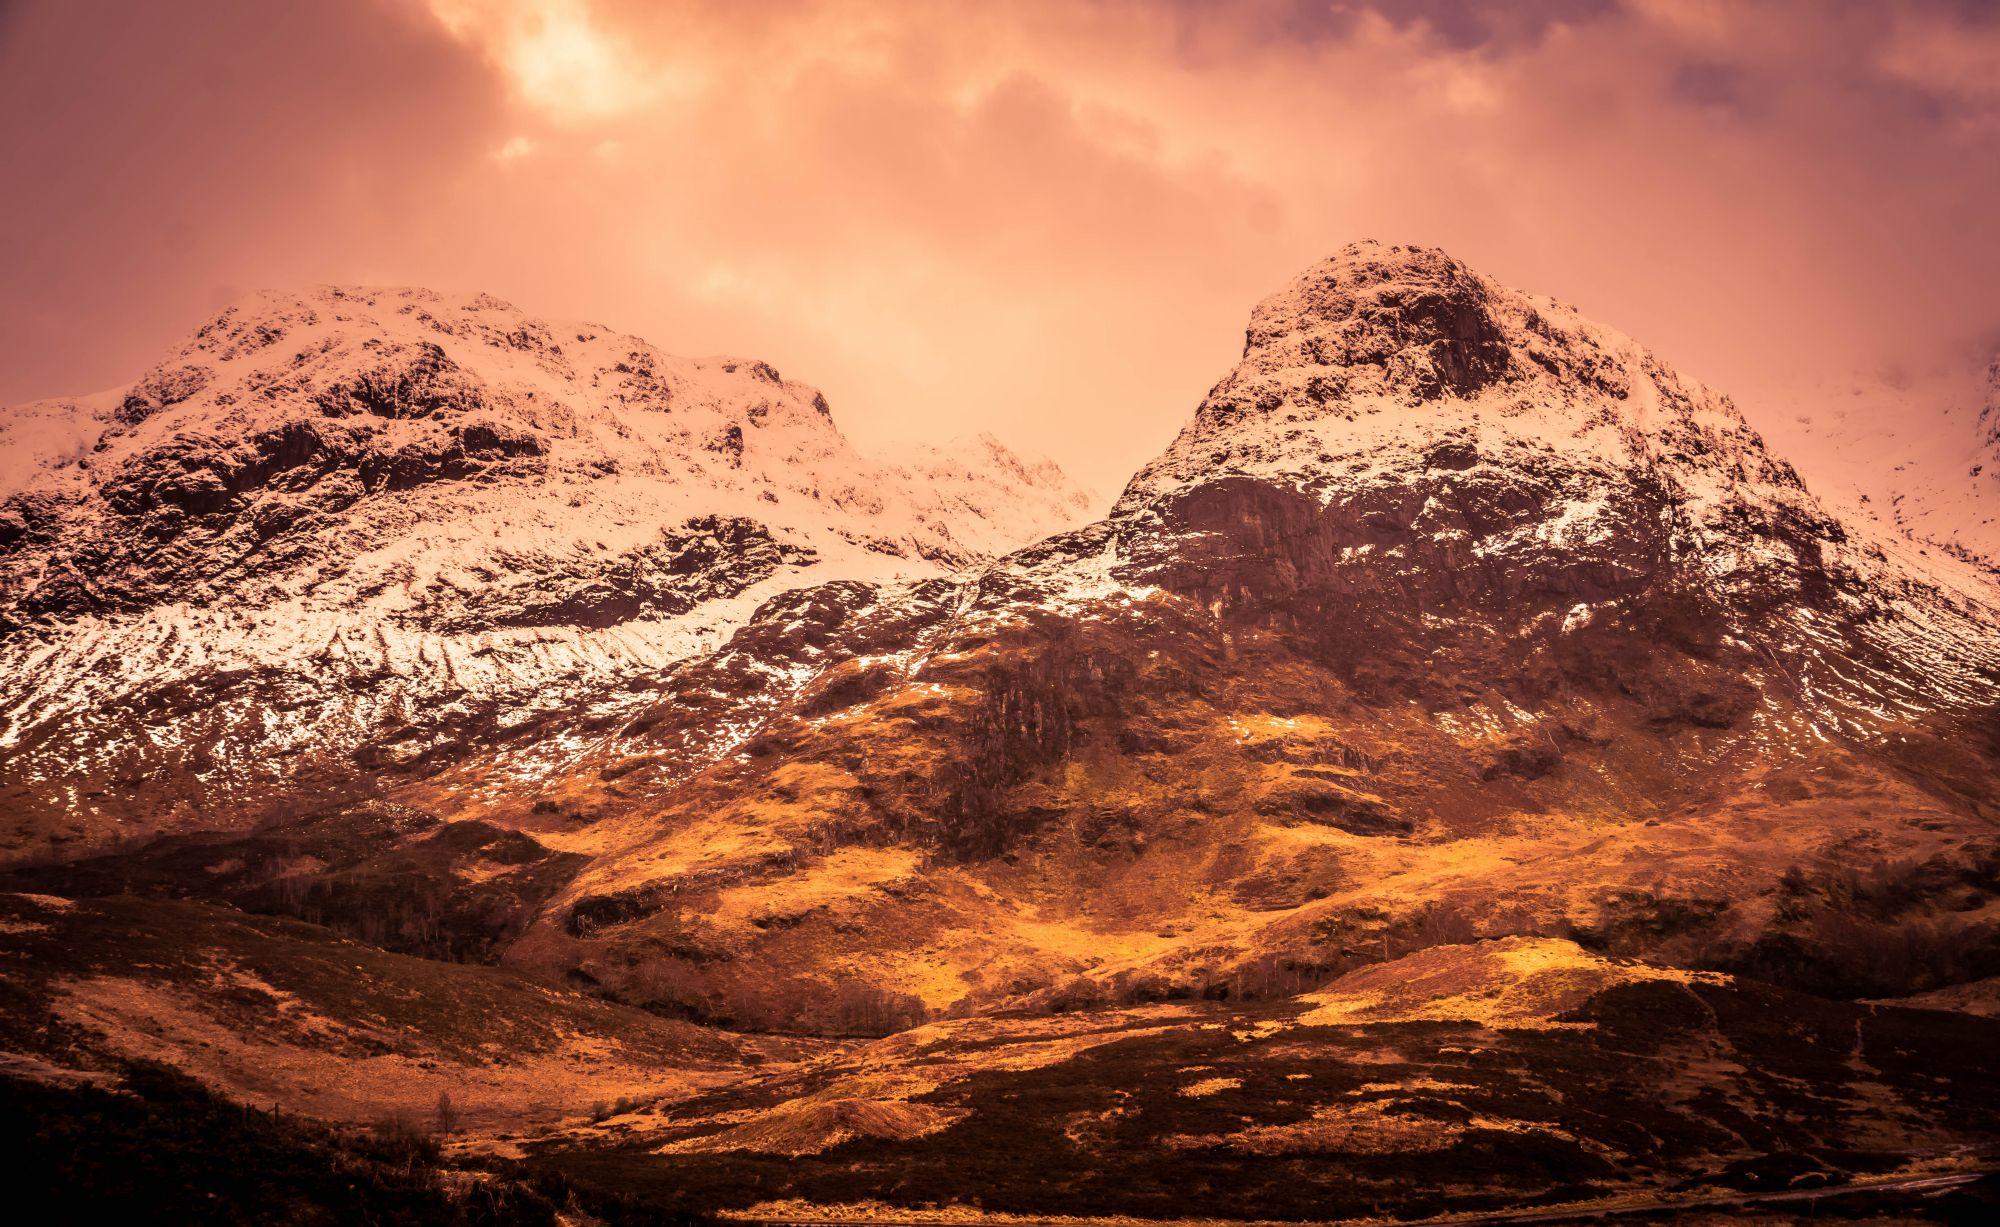 Loch lomond Glencoe highlands